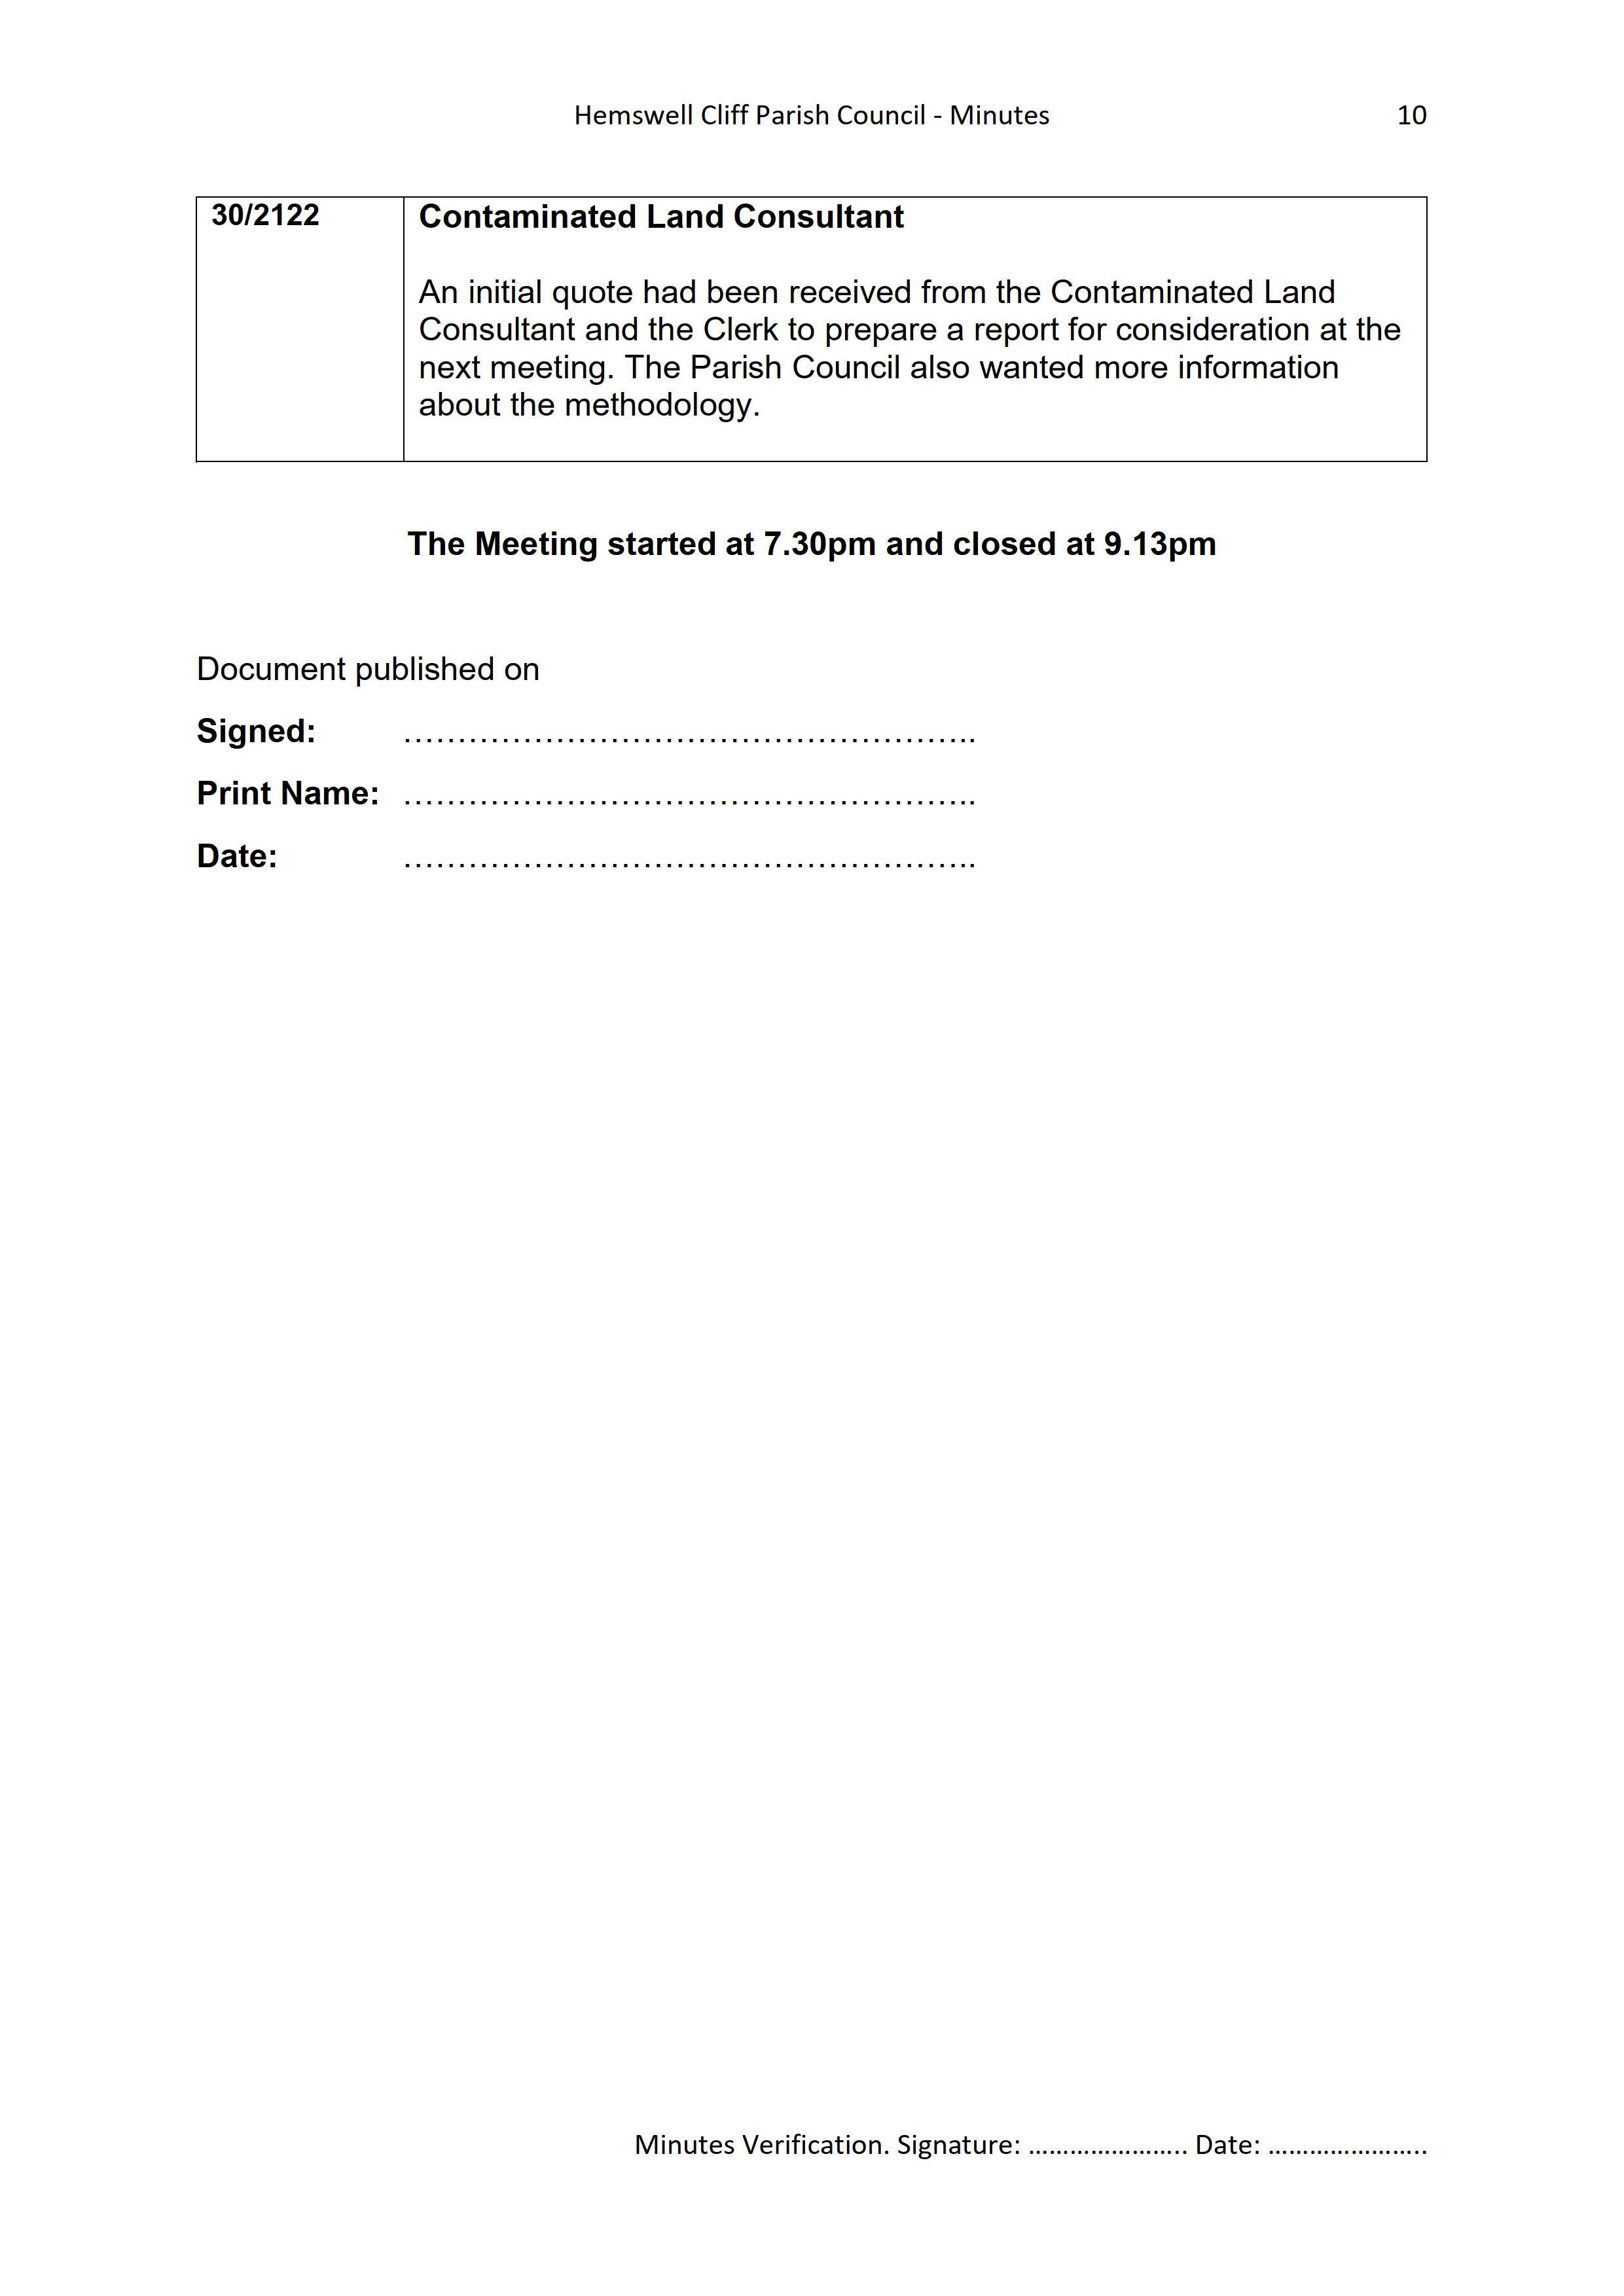 HCPC_AnnualMeetingMinutes_17.05.21_10.jpg